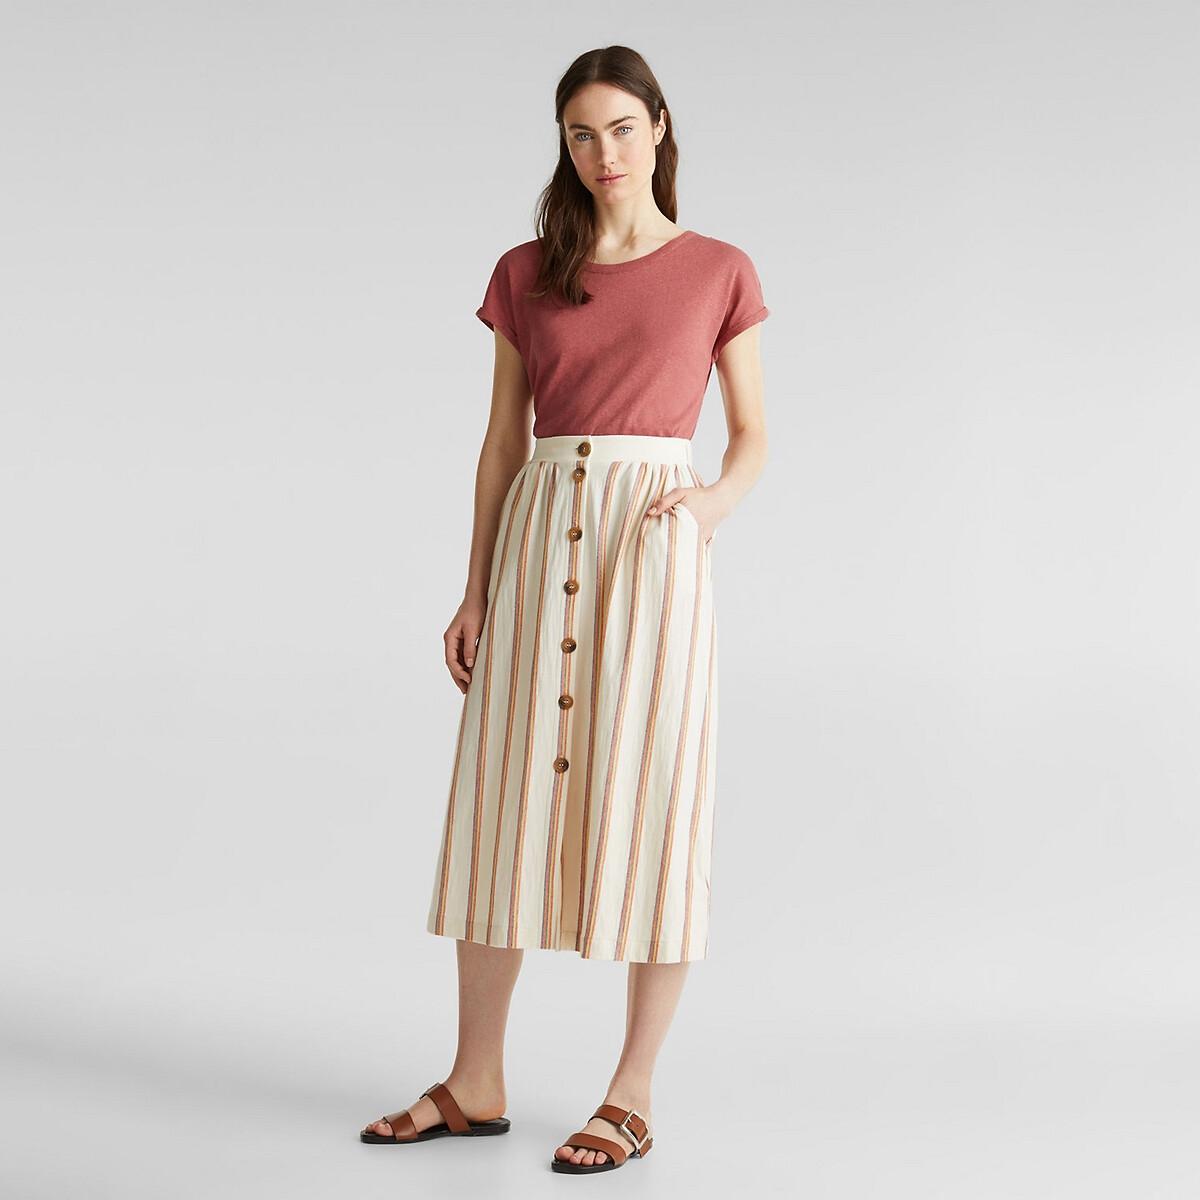 Falda midi a rayas, abotonada